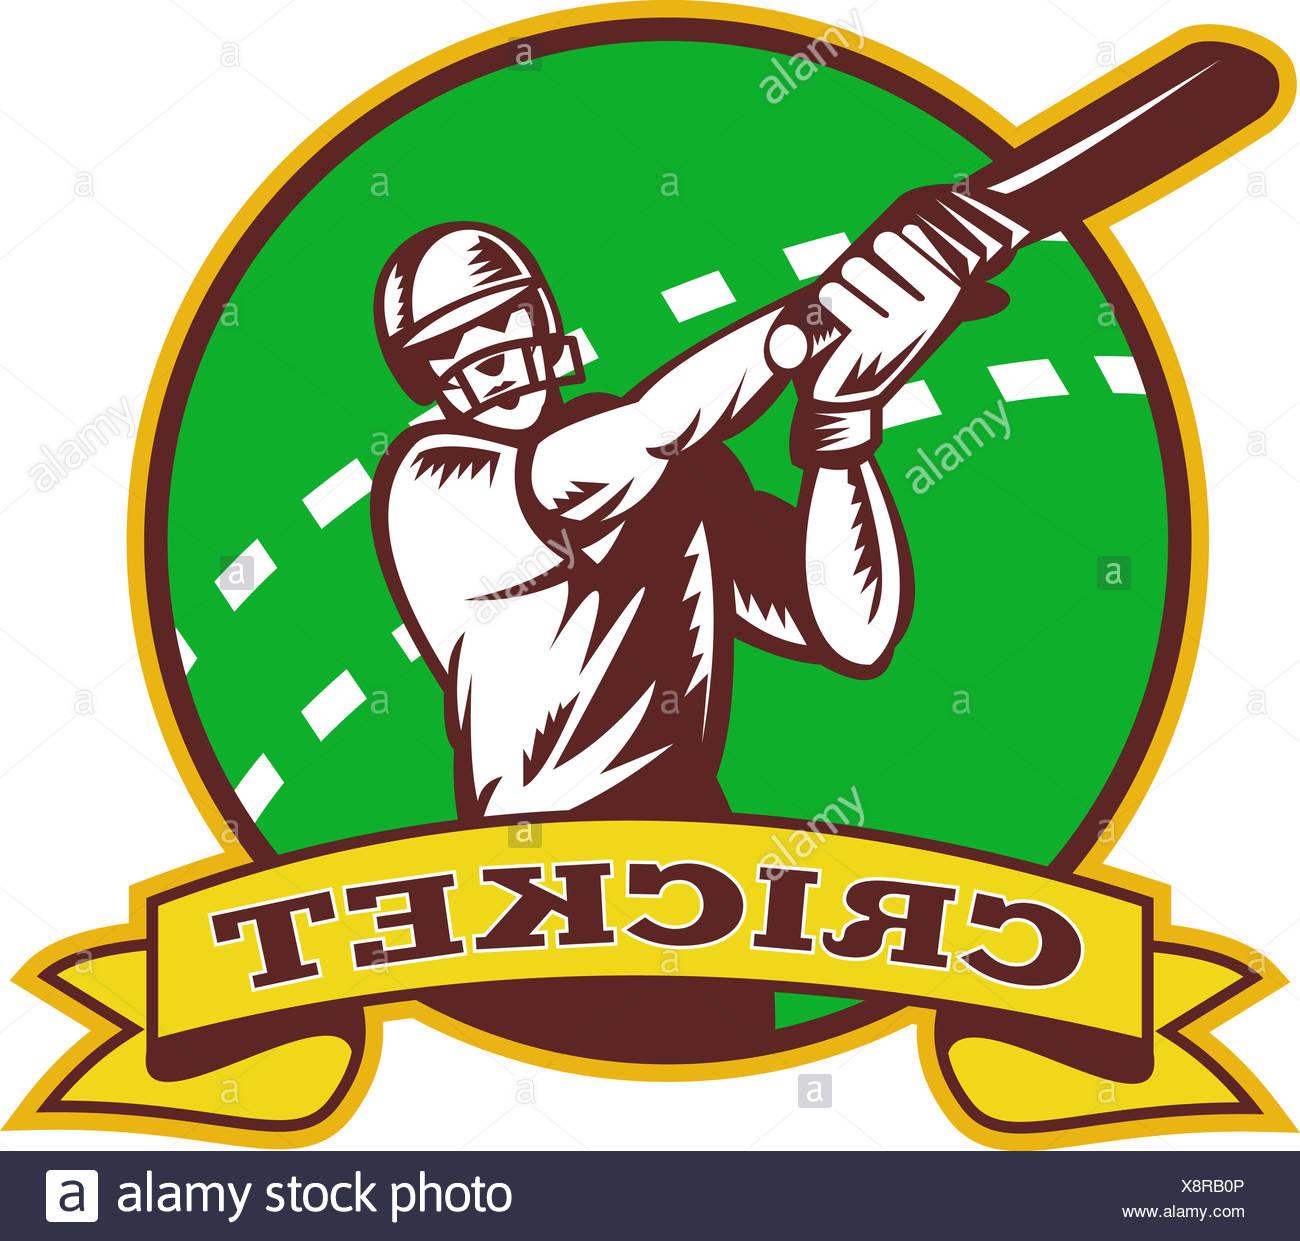 cricket batsman batting - Stock Image